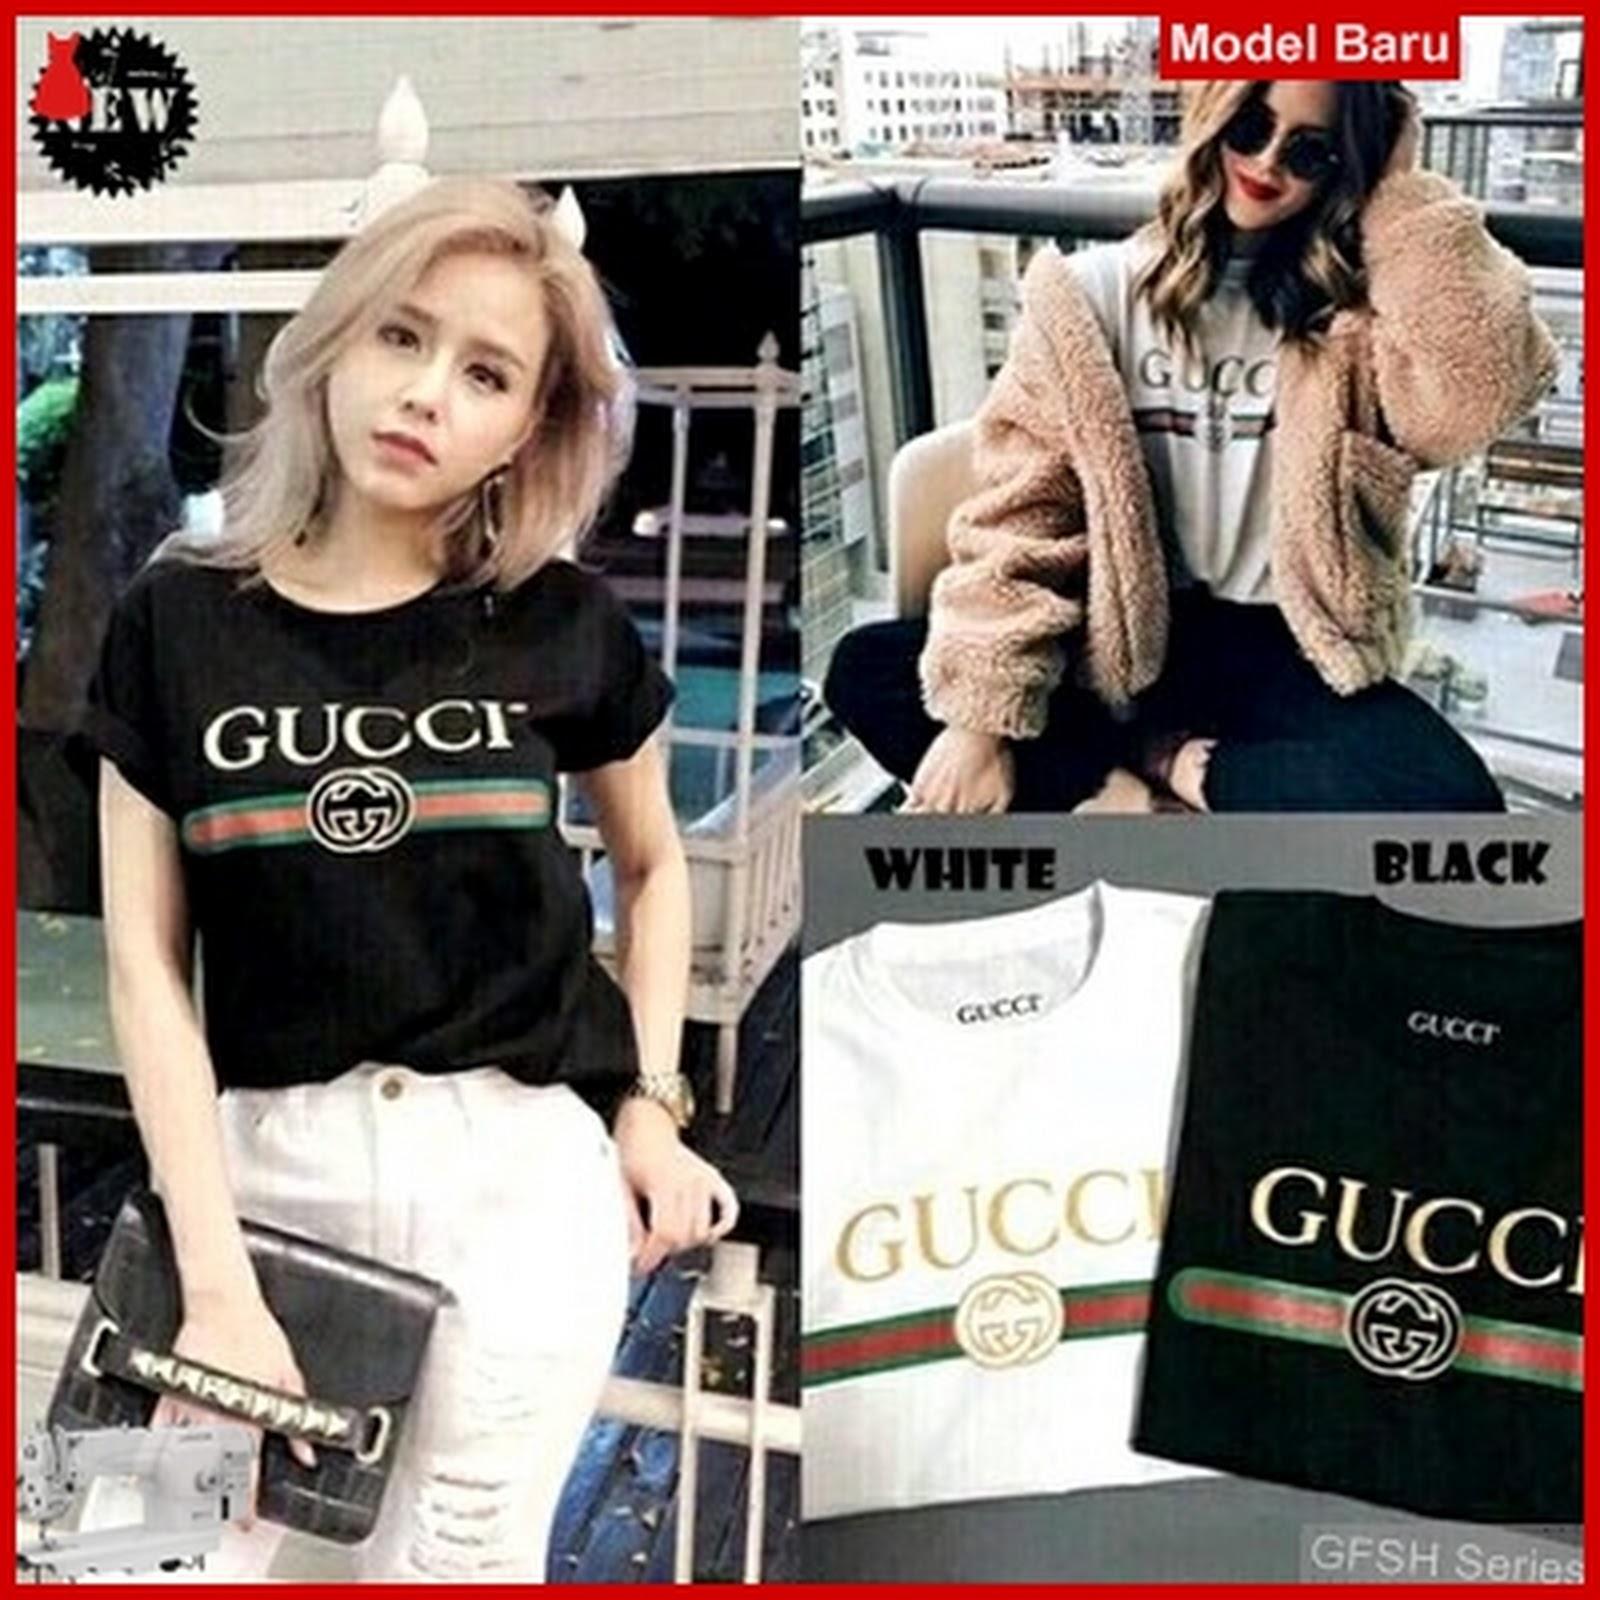 GFSH1269126 Setelan Gucci Keren Terbaru Tee BMG bdddc5db9f